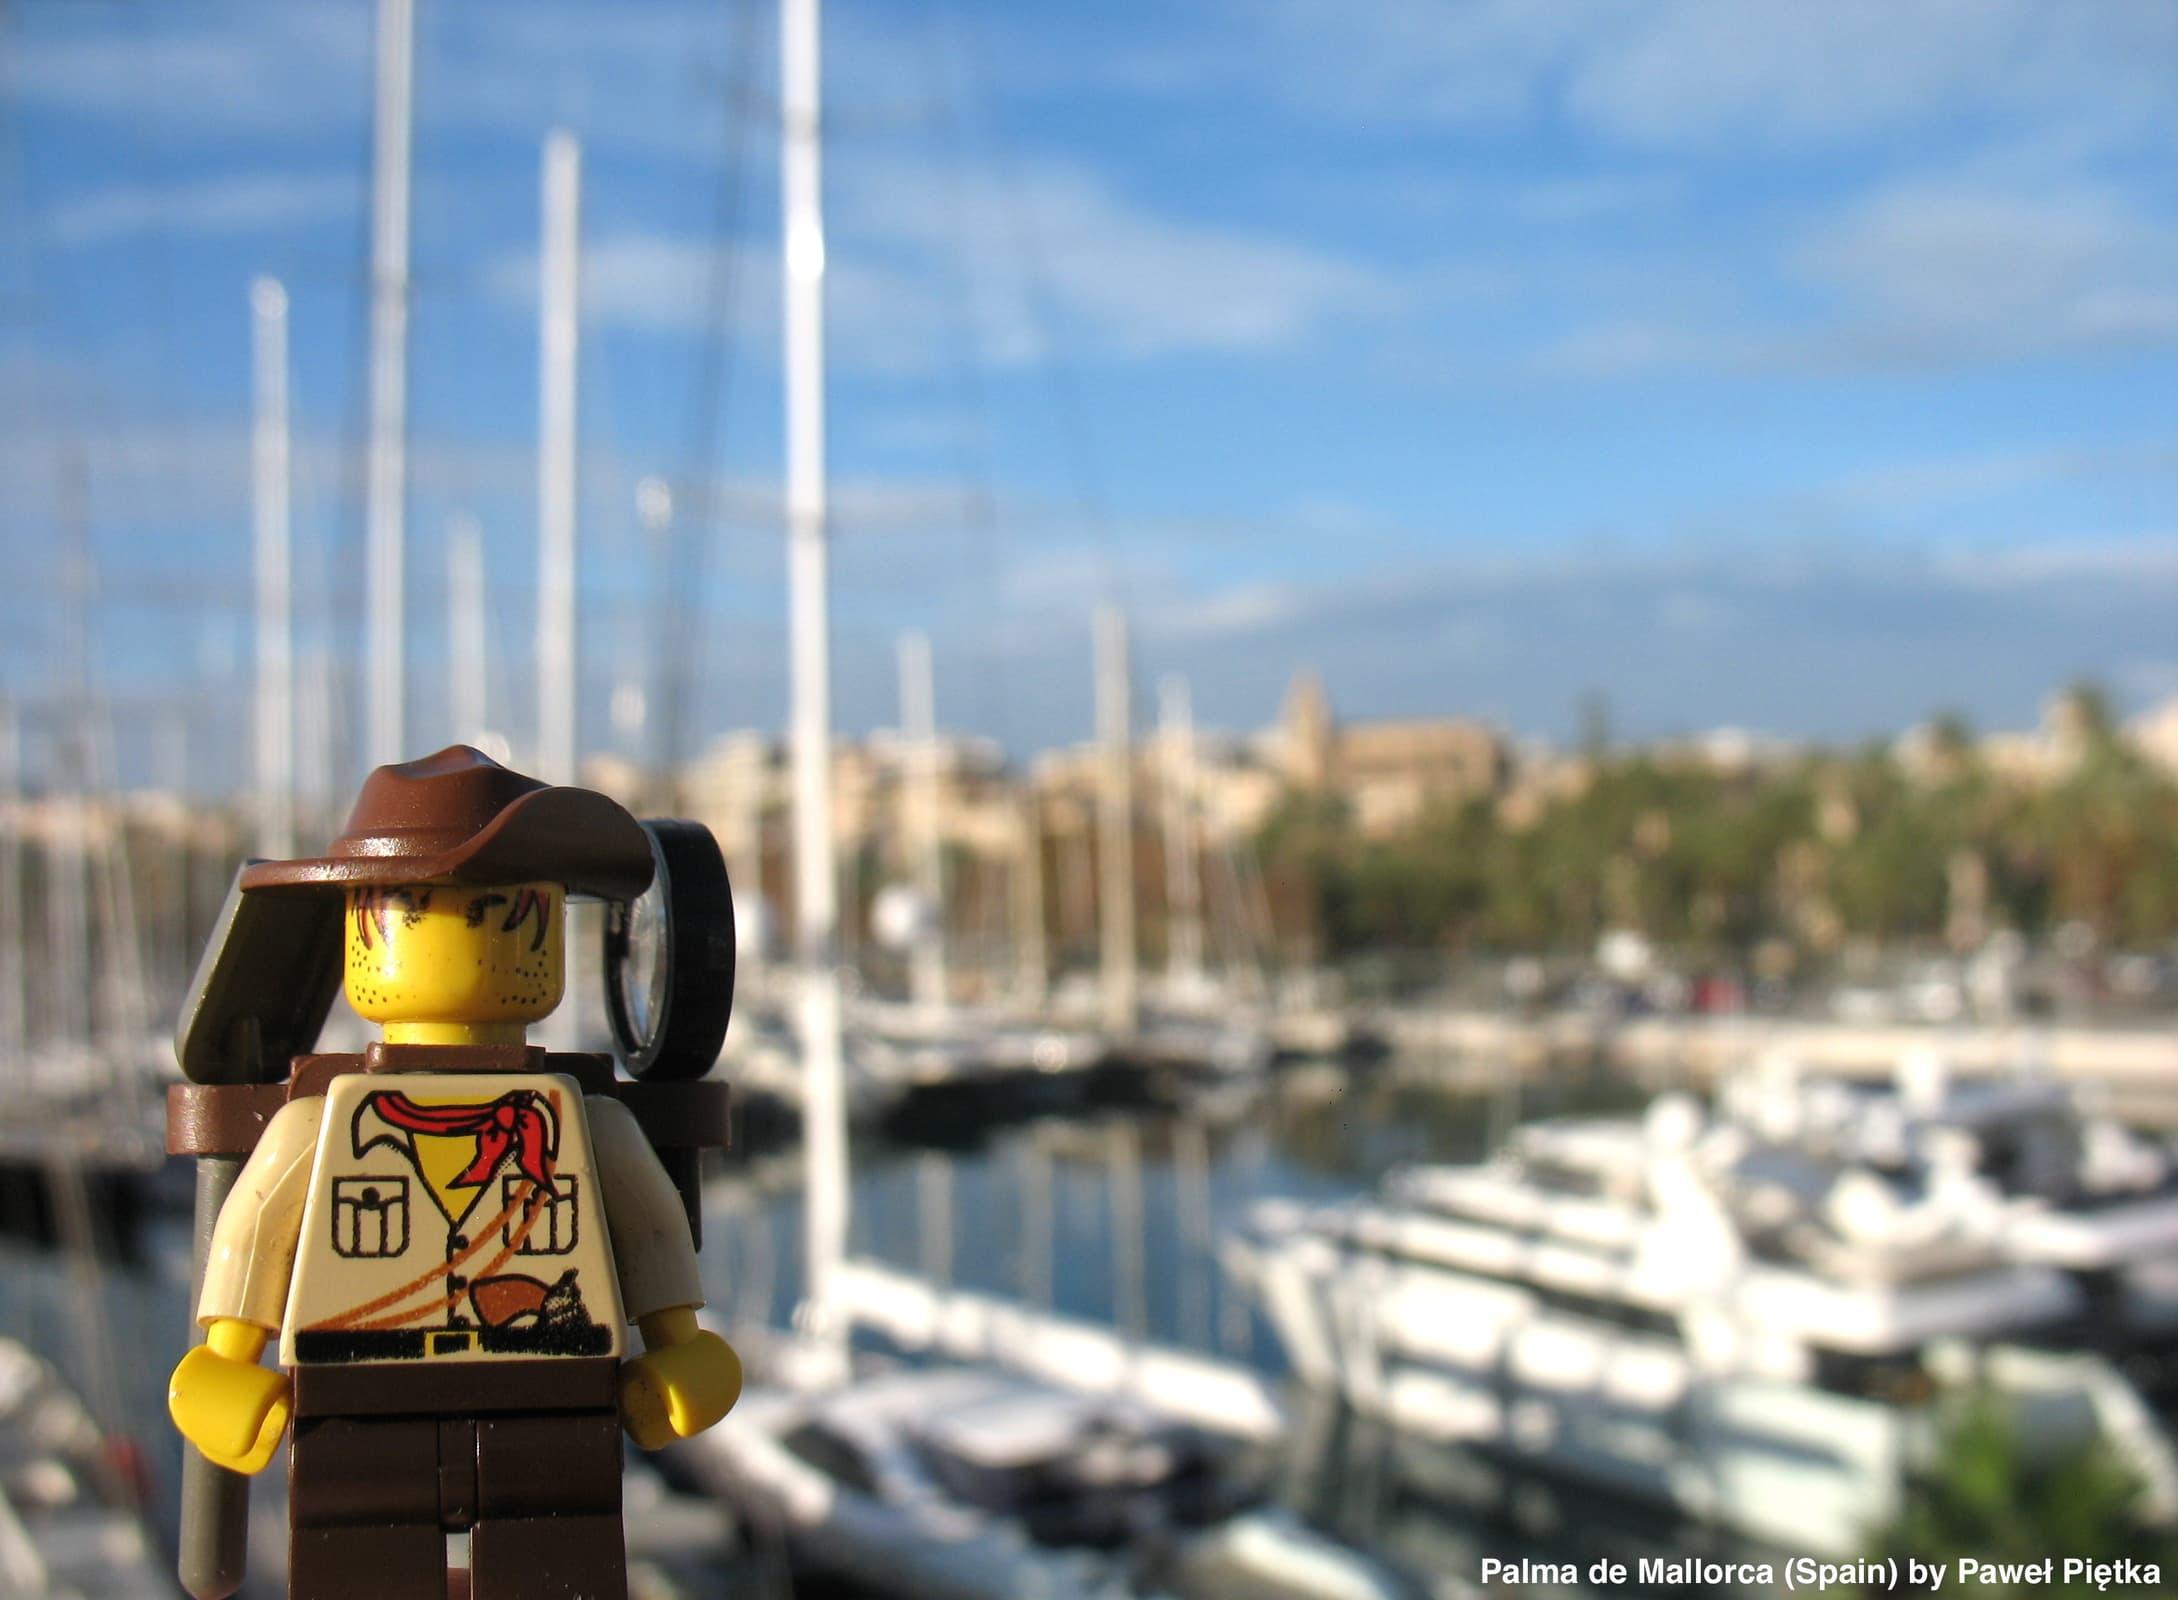 Palma de Mallorca (Spain) - Harbour of Palma 2